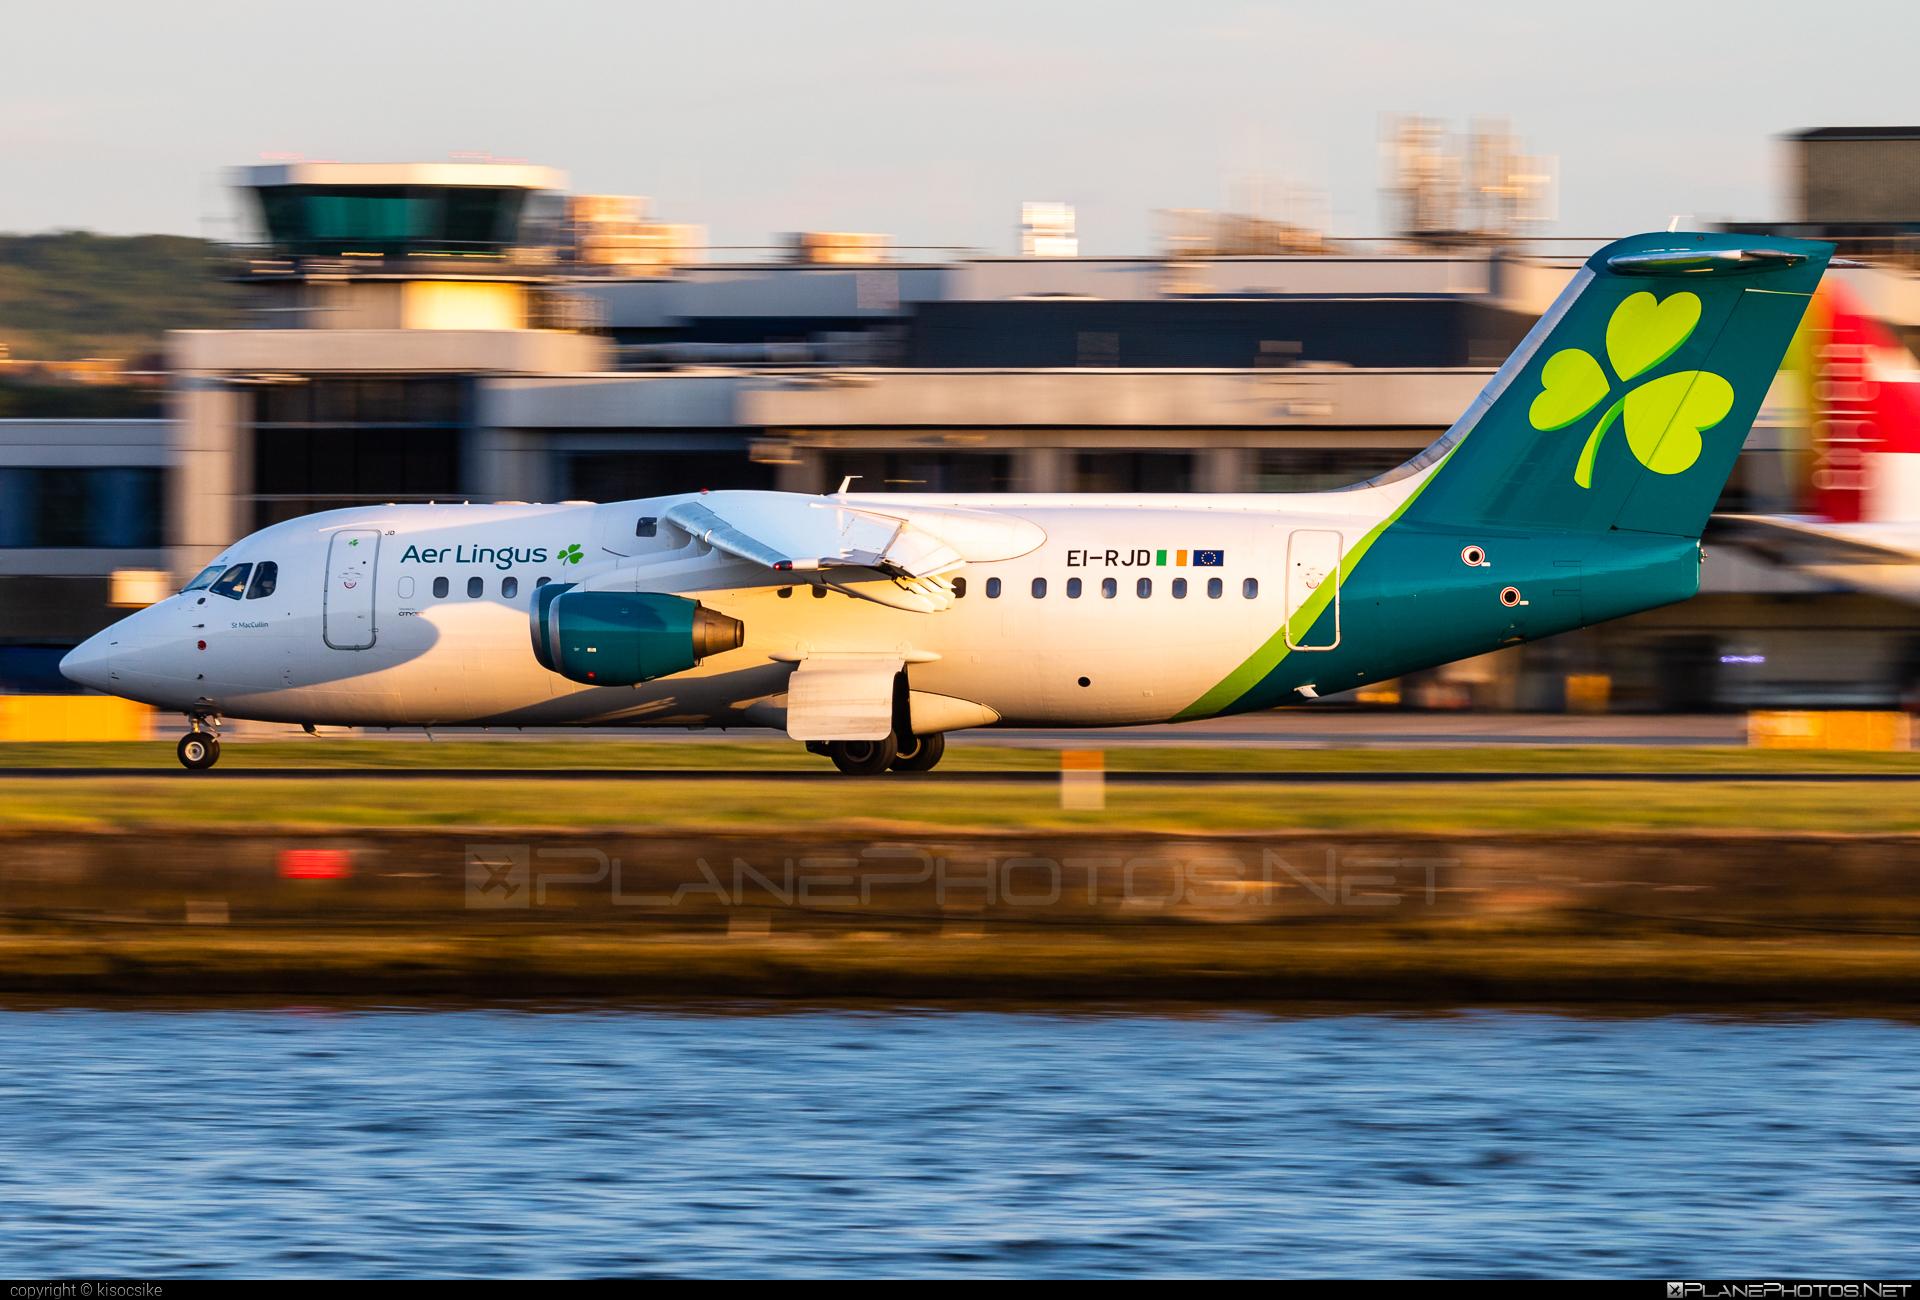 Aer Lingus British Aerospace Avro RJ85 - EI-RJD #aerlingus #avro146rj85 #avrorj85 #bae146 #britishaerospace